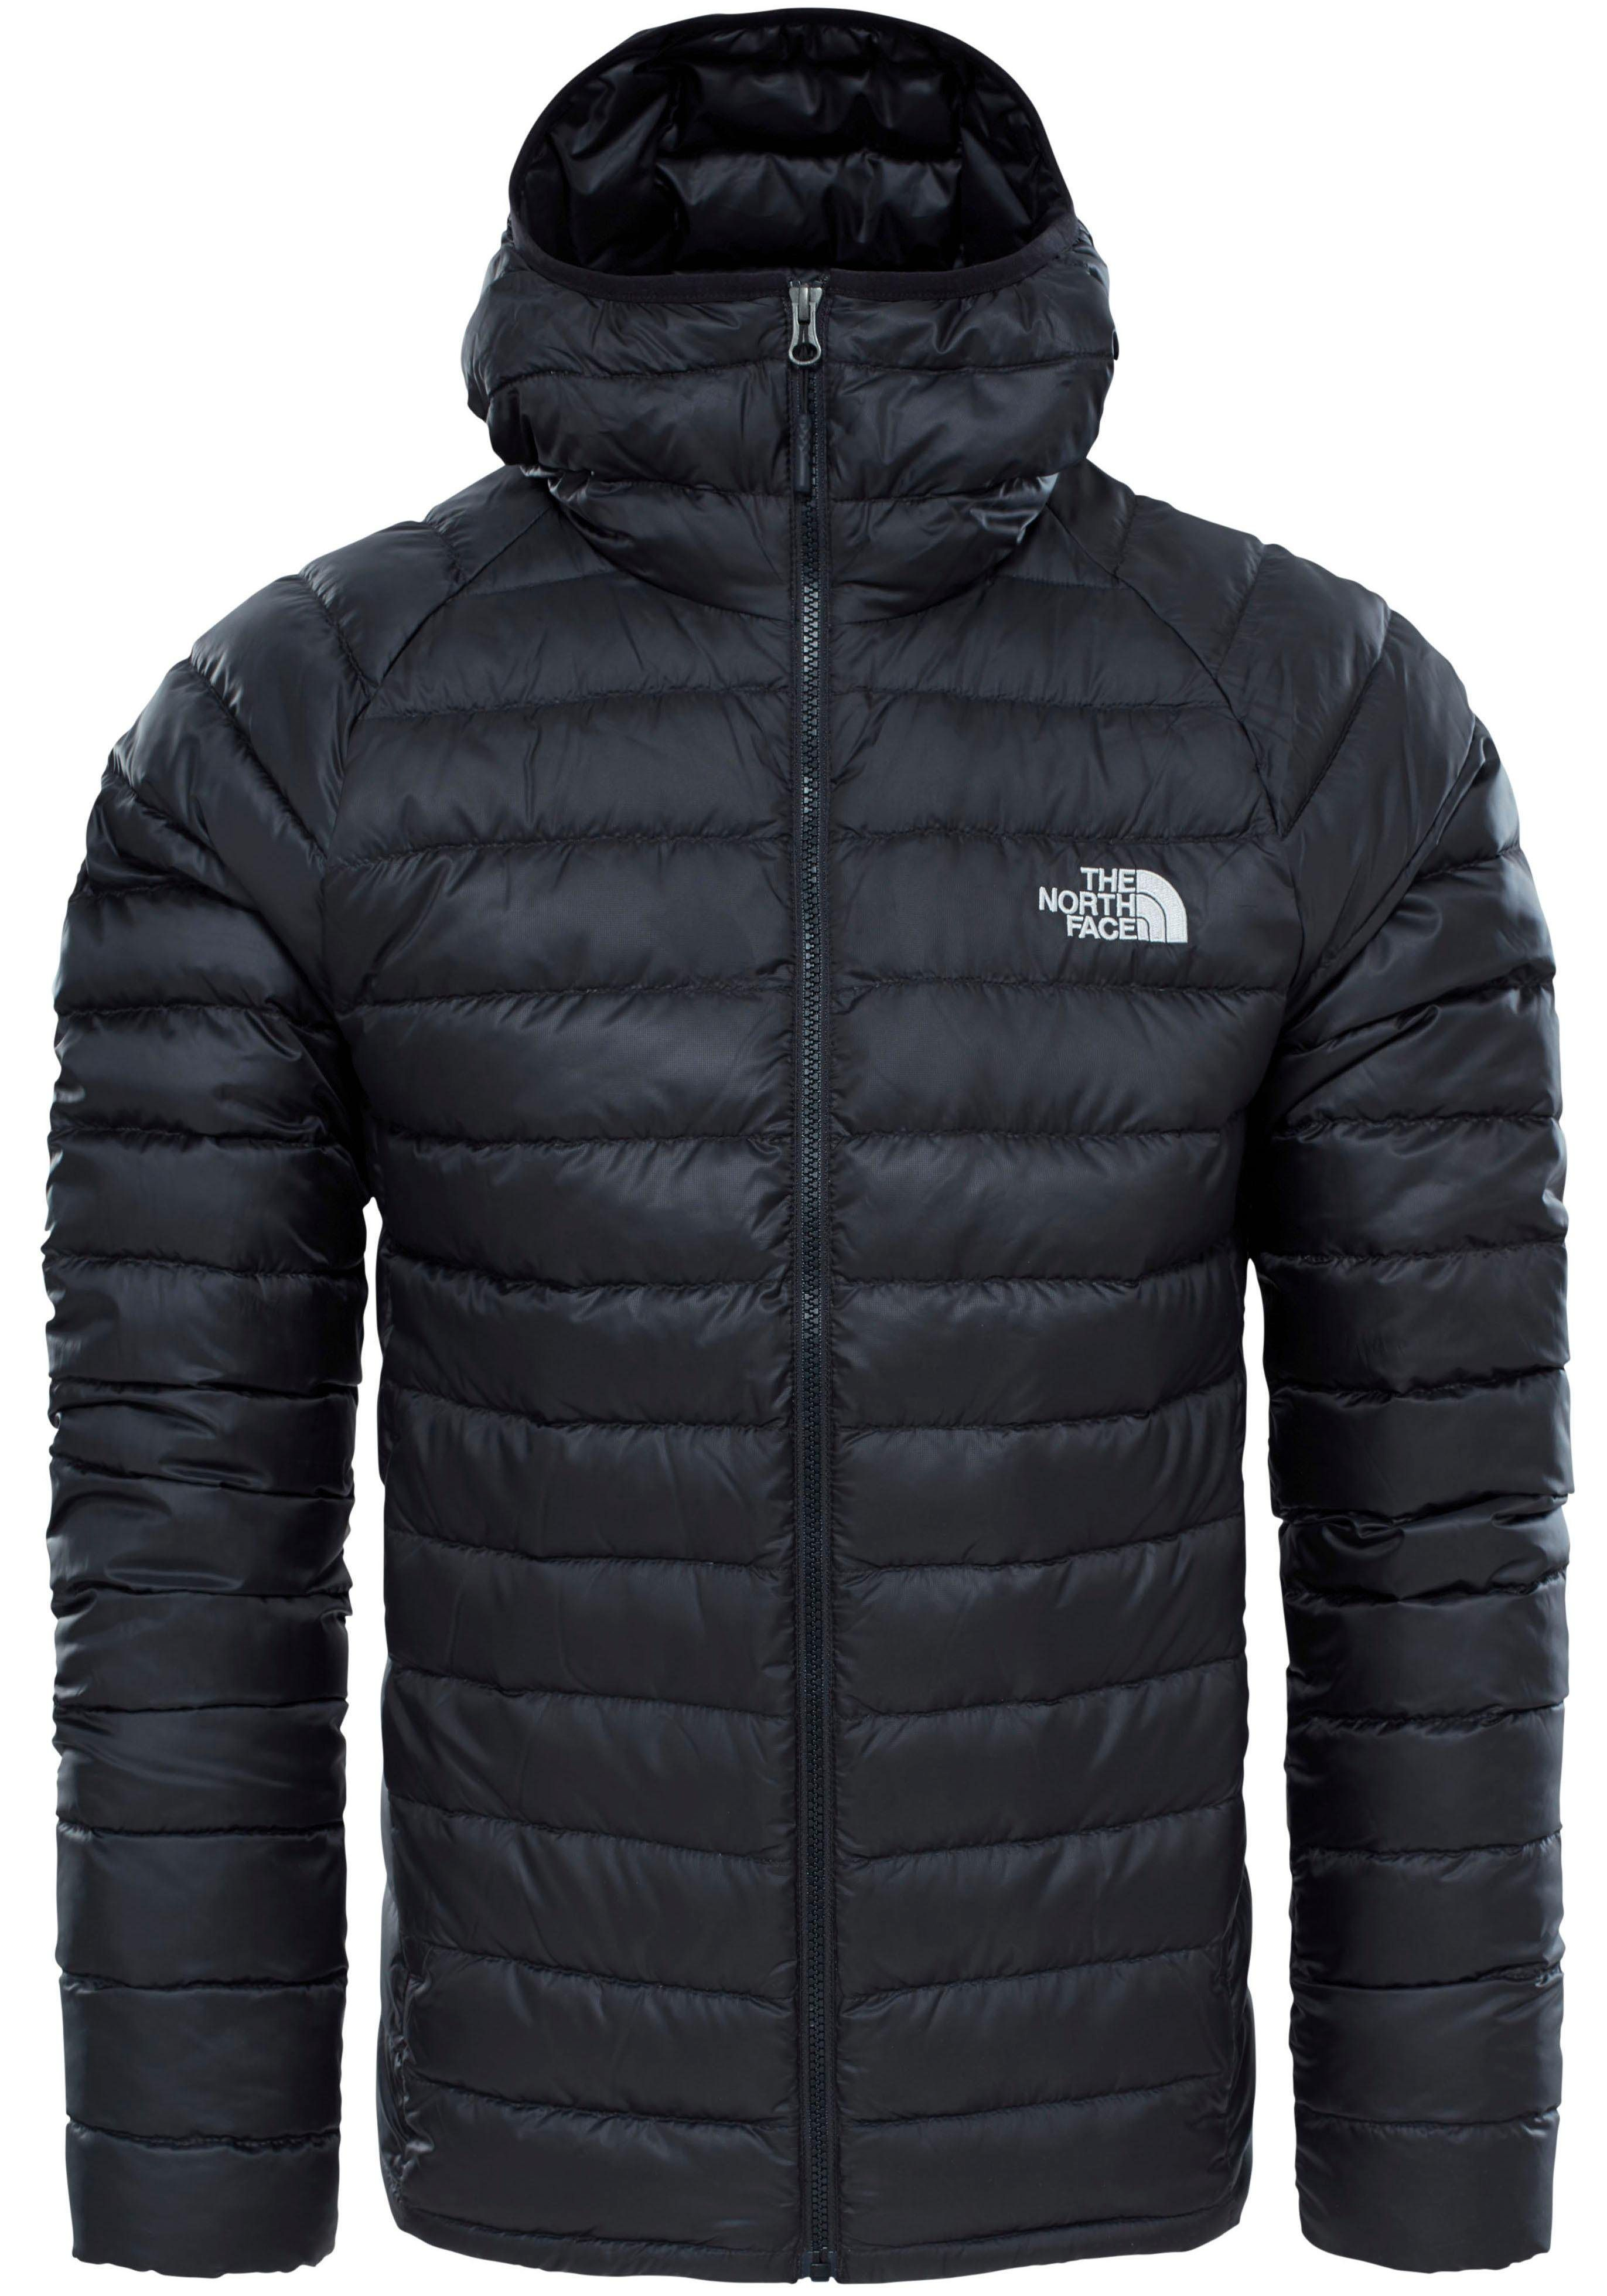 The North Face Steppjacke Trevail Jetzt Bestellen Unter Https Mode Ladendirekt De Herren Bek North Face Hooded Jacket North Face Jacket Warm Fleece Jacket